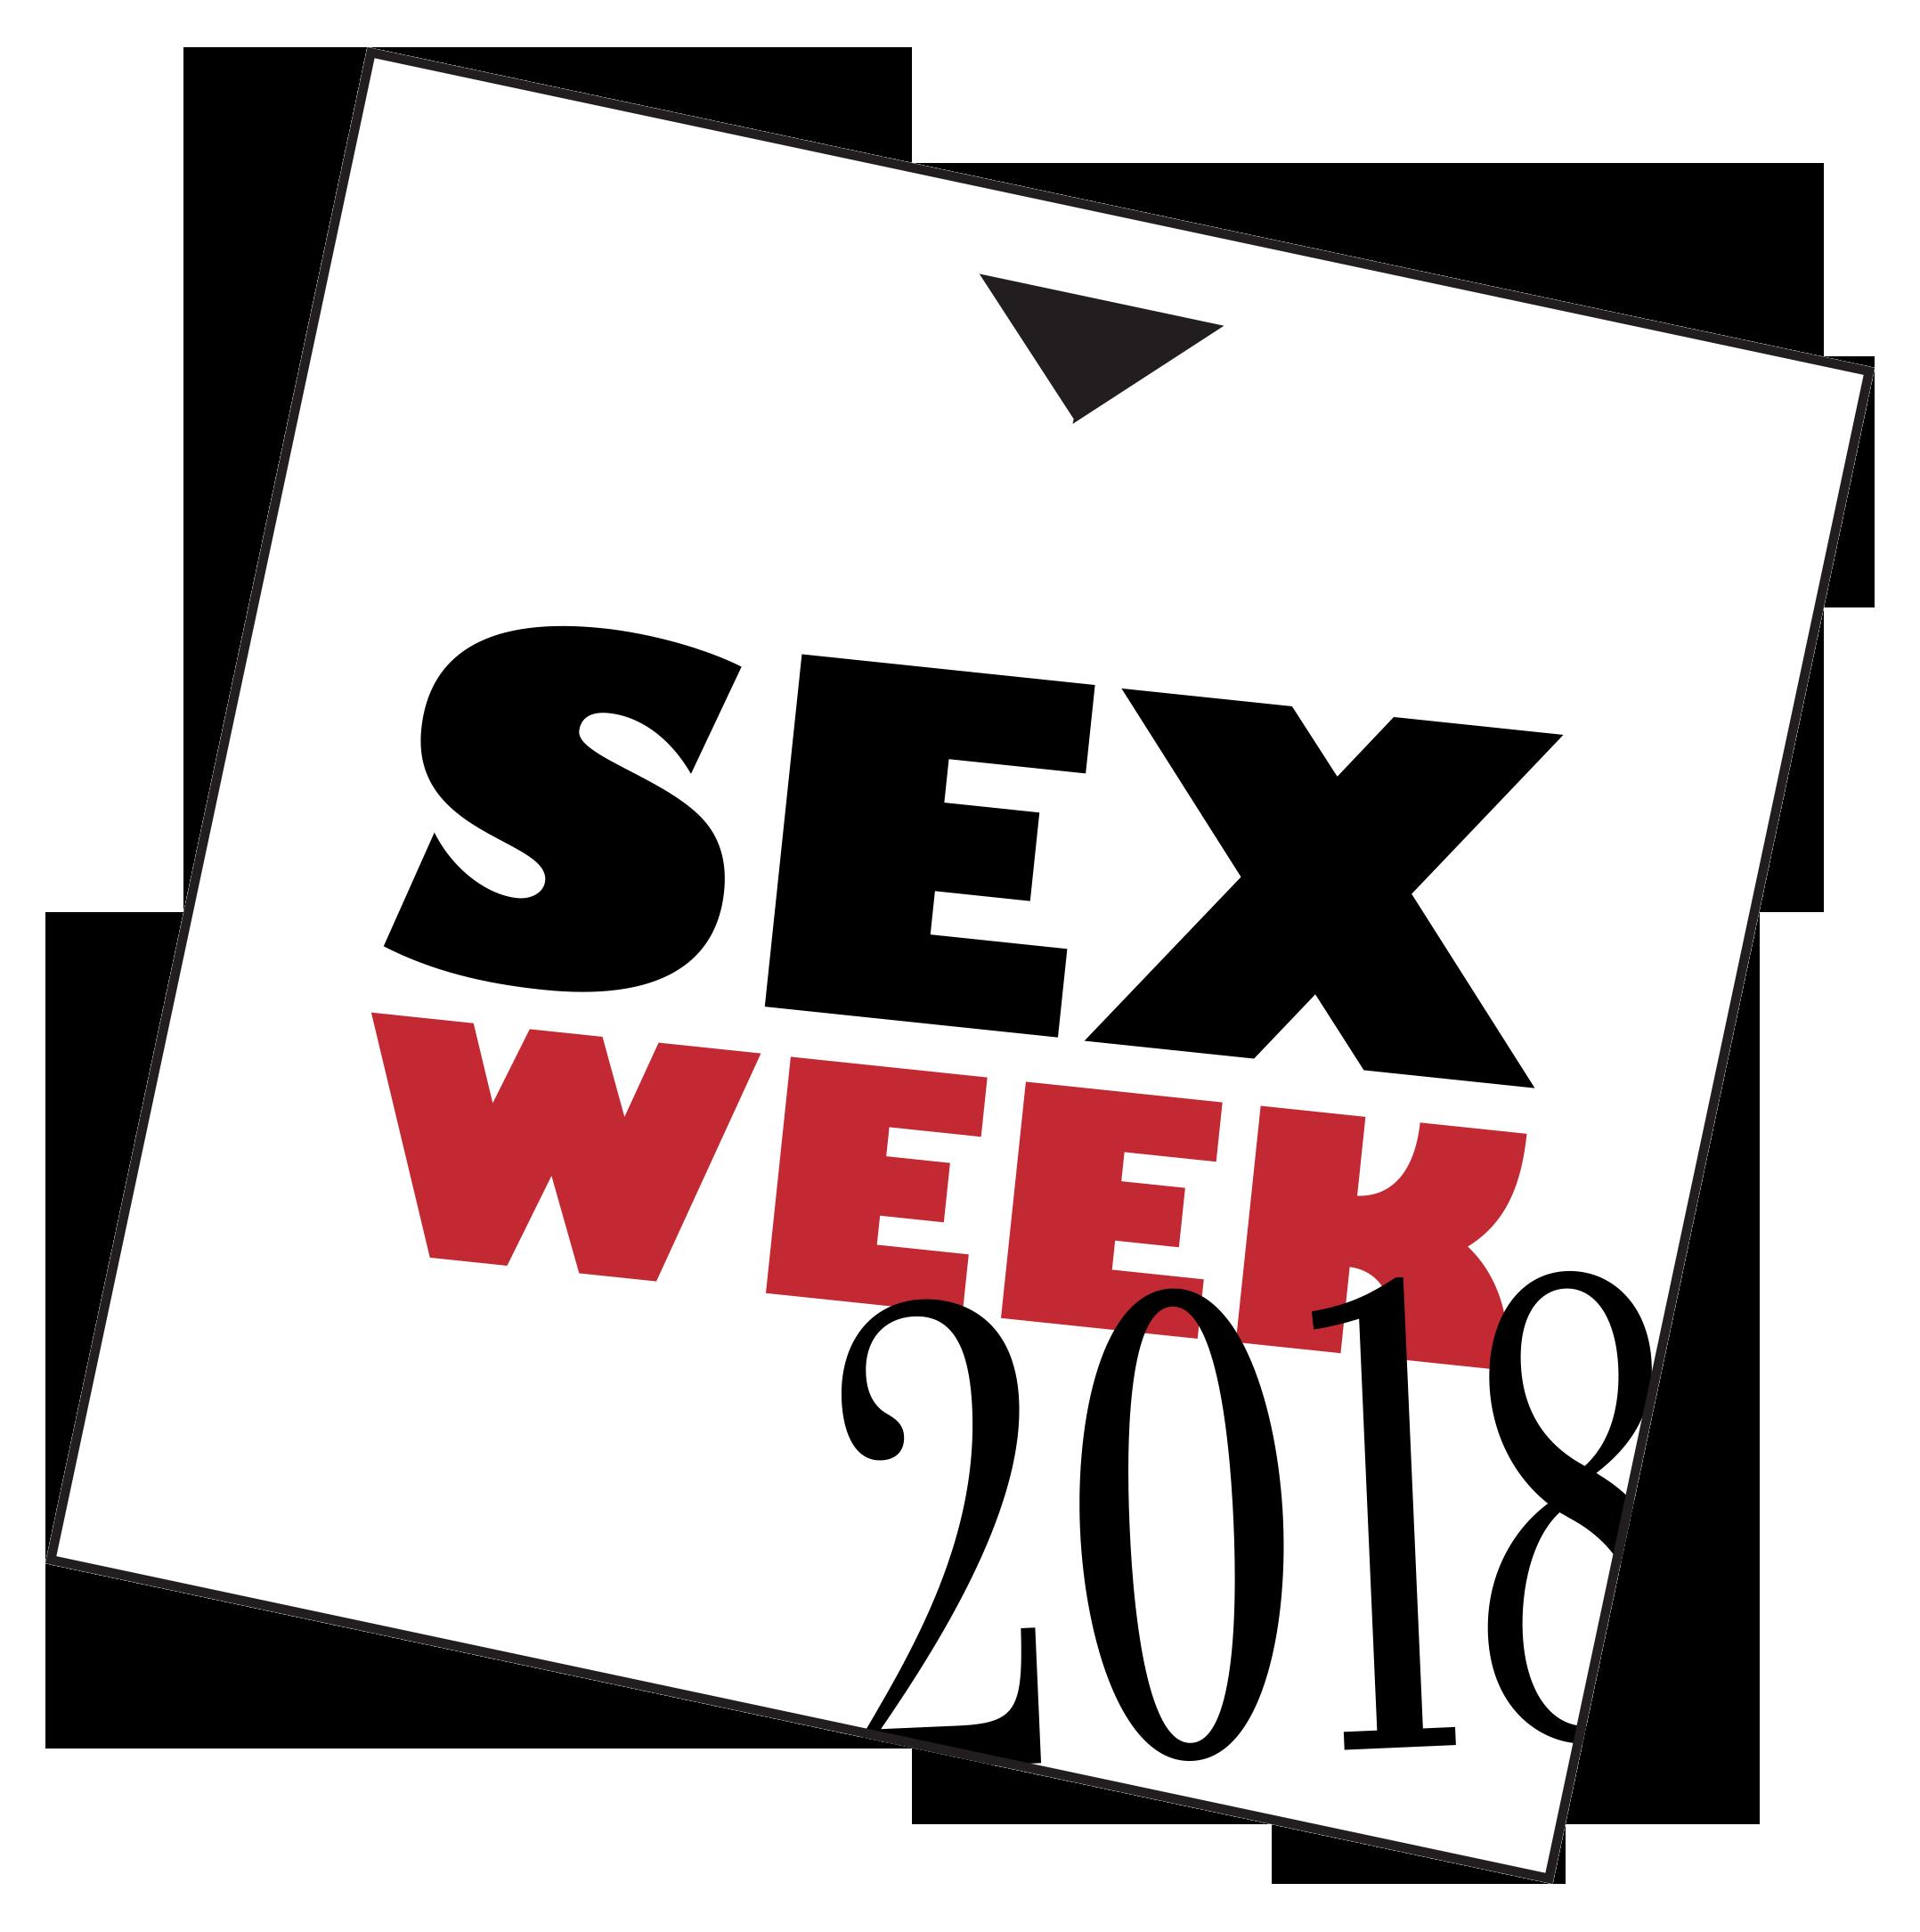 sexwk logo 1.png